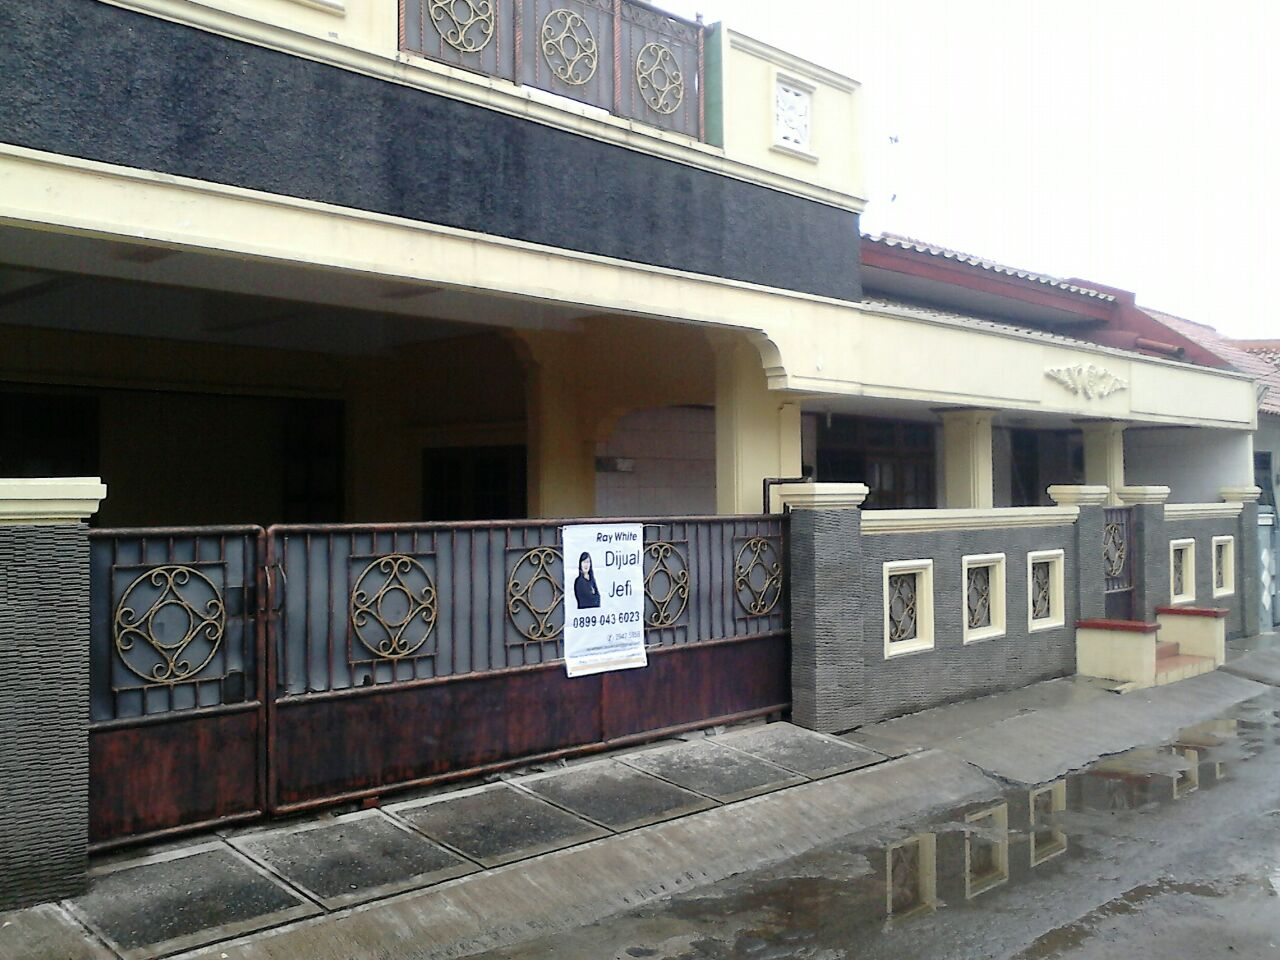 Rumah Dijual Siap Huni di Patria Jaya, Jati Rahayu, Pondok Gede, Jakarta Timur